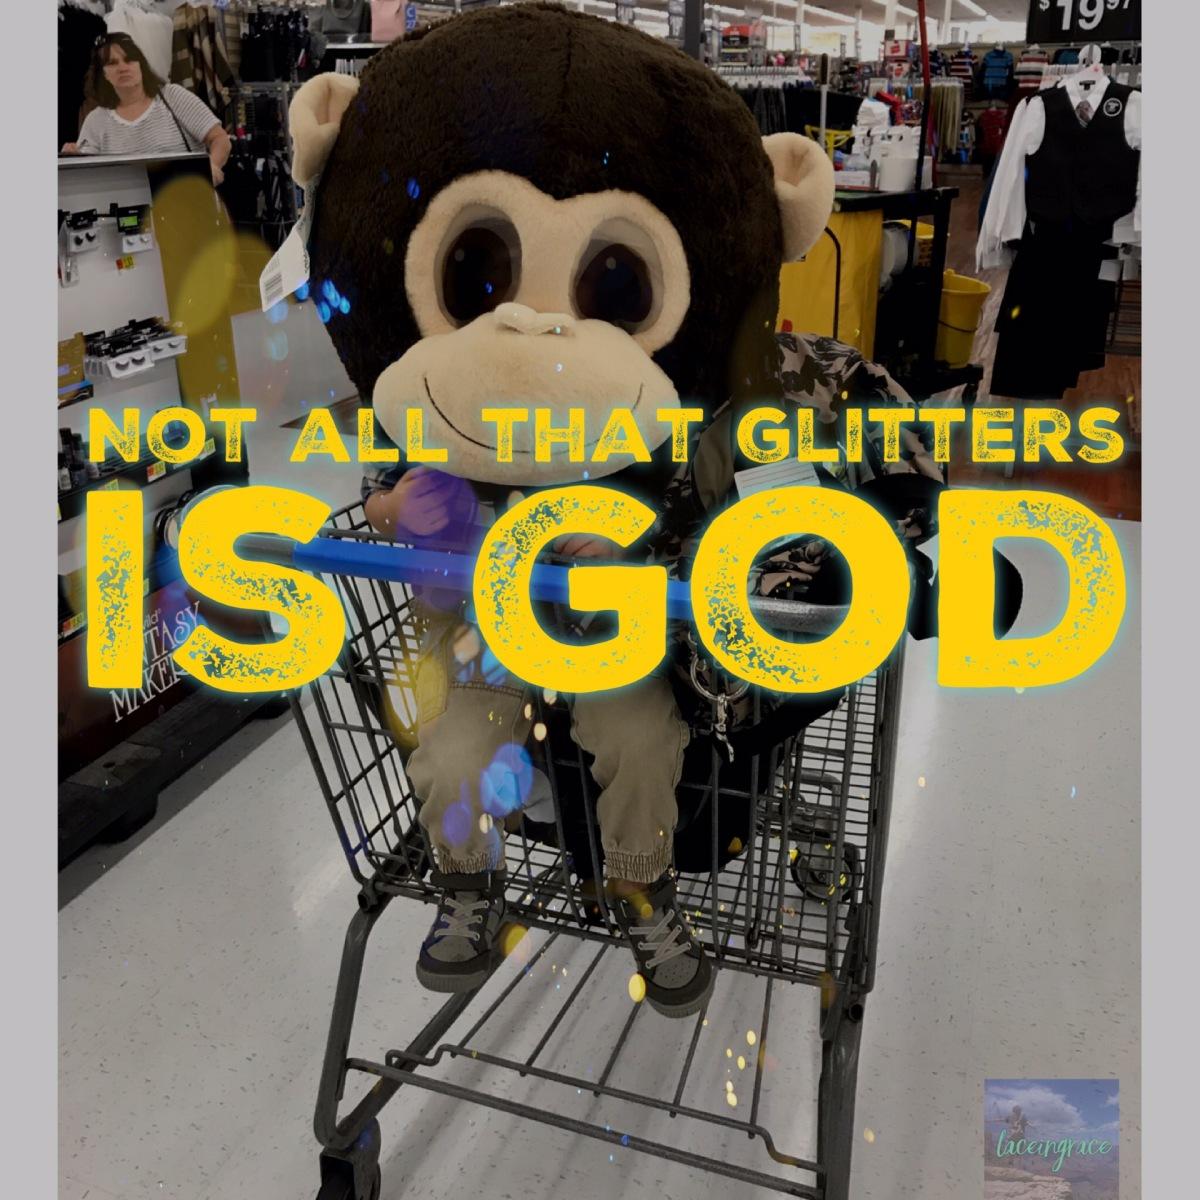 Not all that glitters isGod